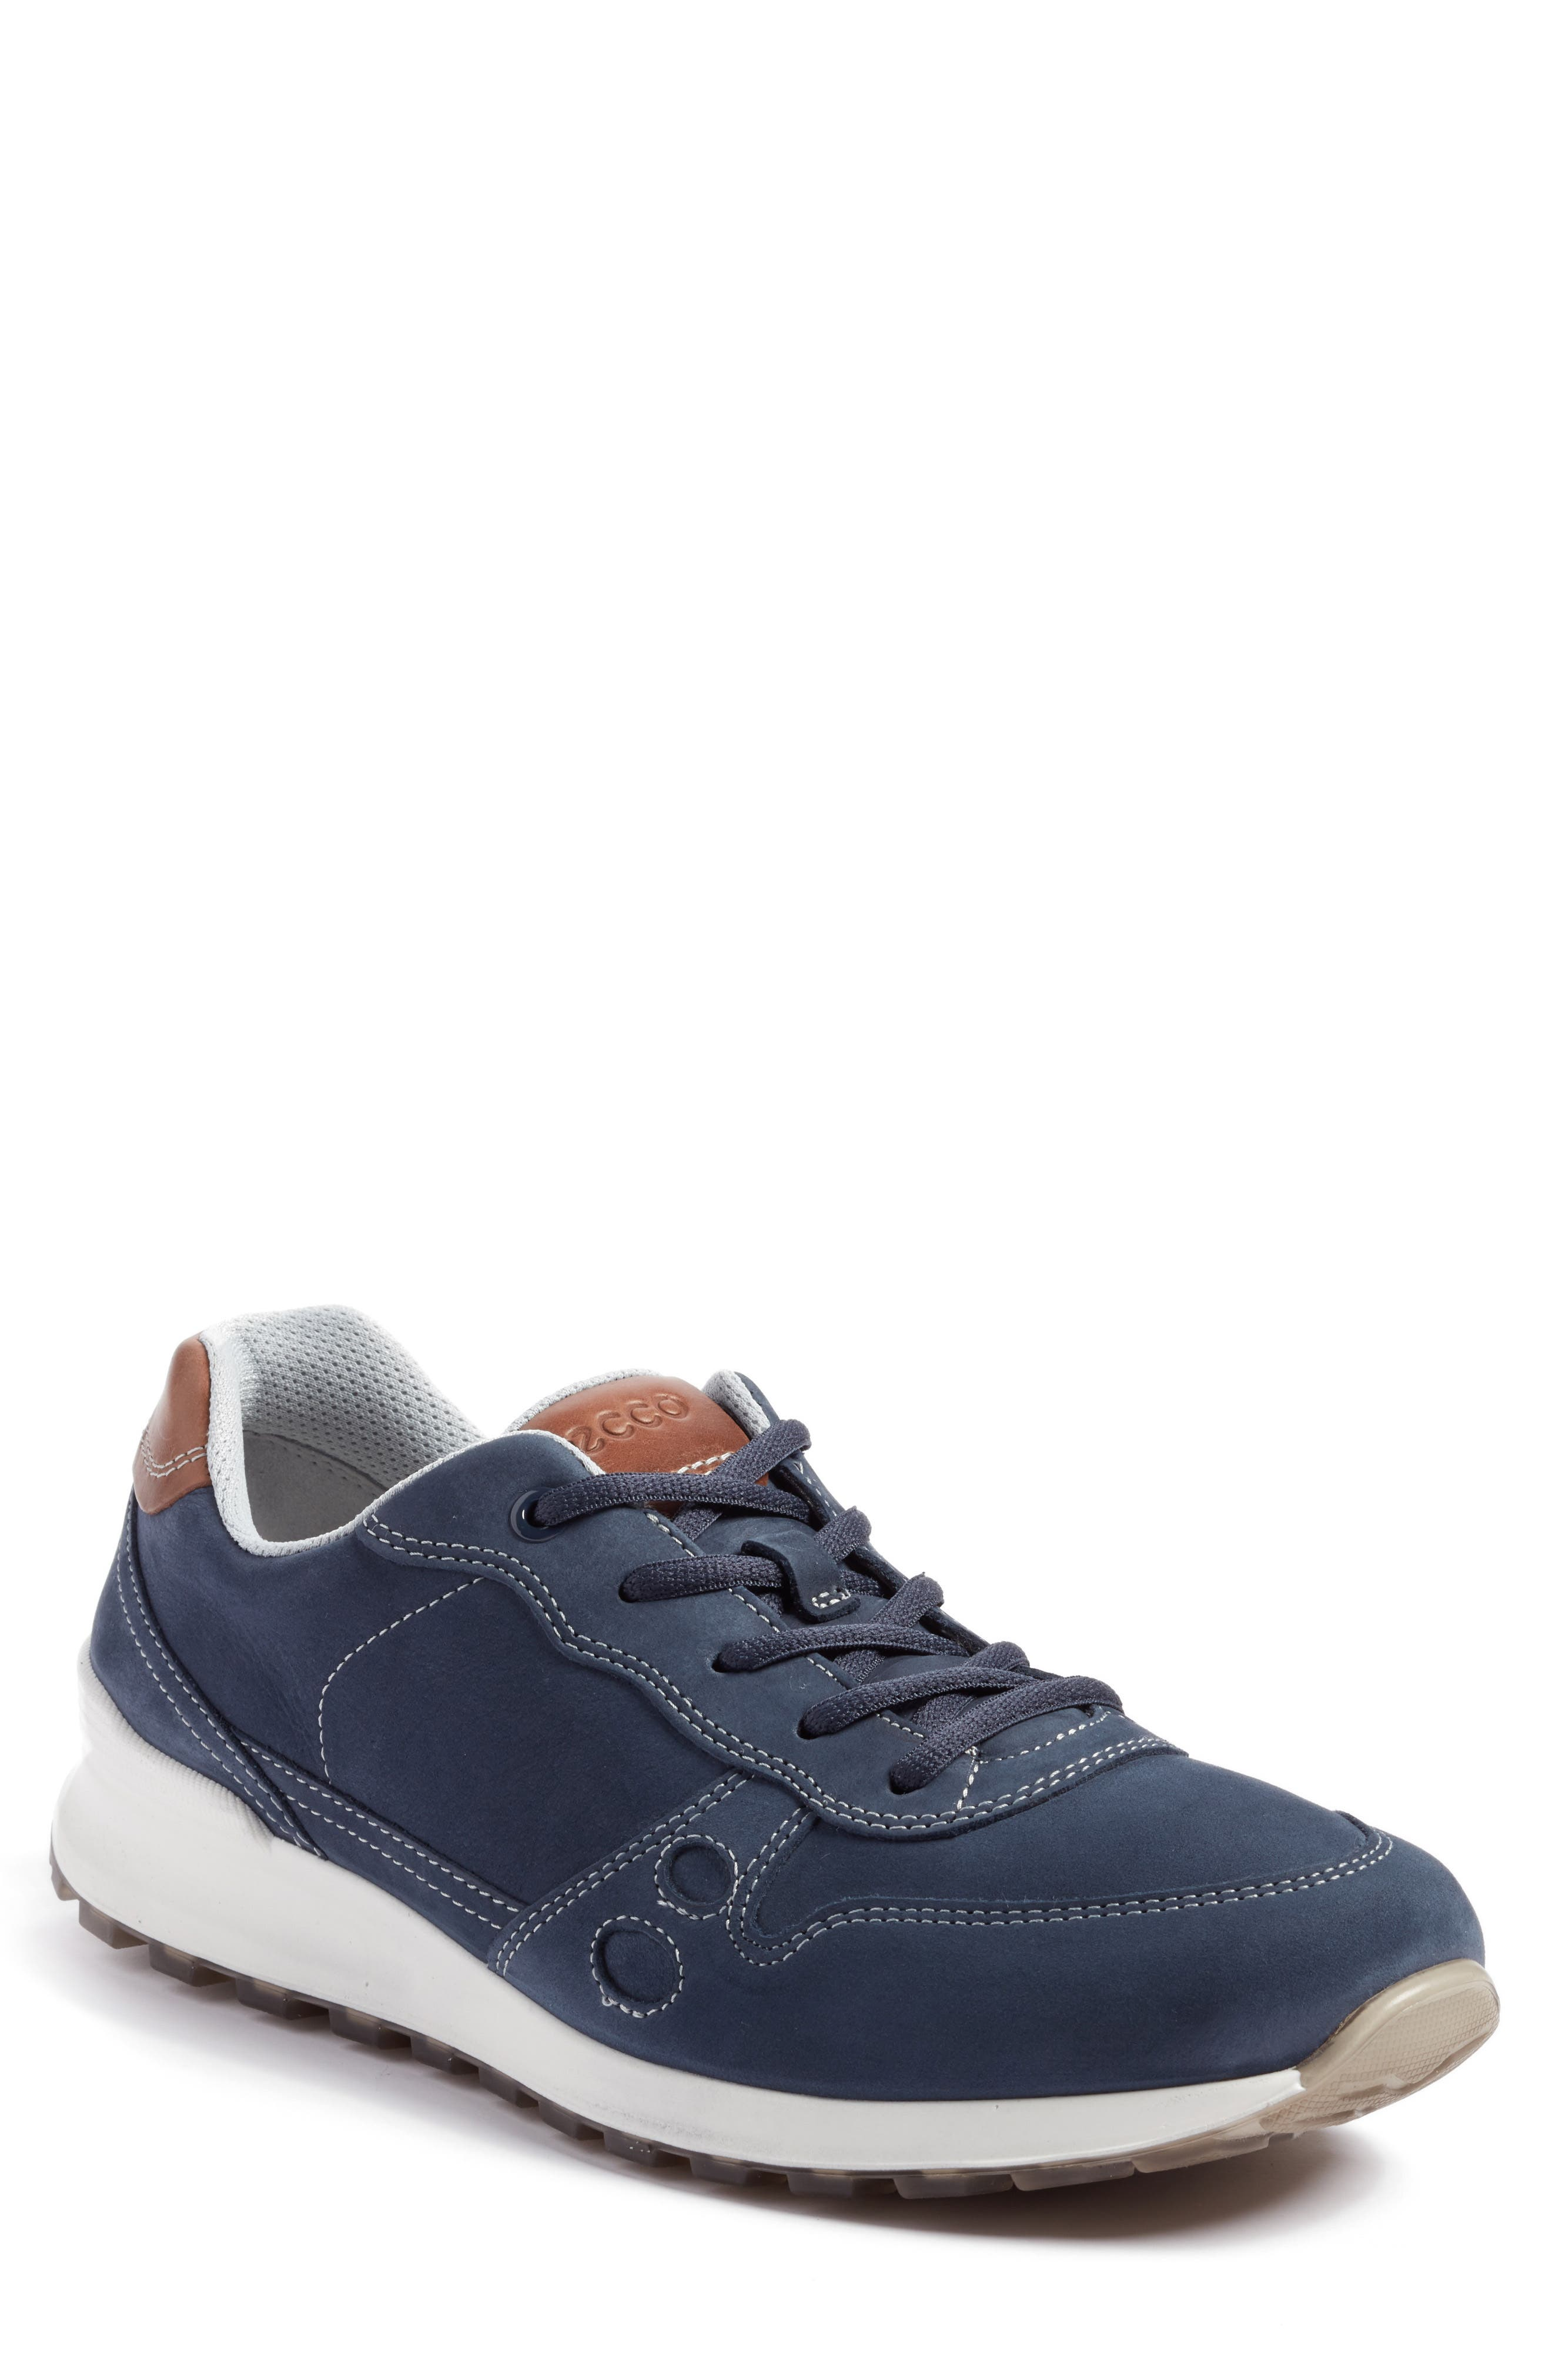 CS14 Retro Sneaker,                             Main thumbnail 1, color,                             408